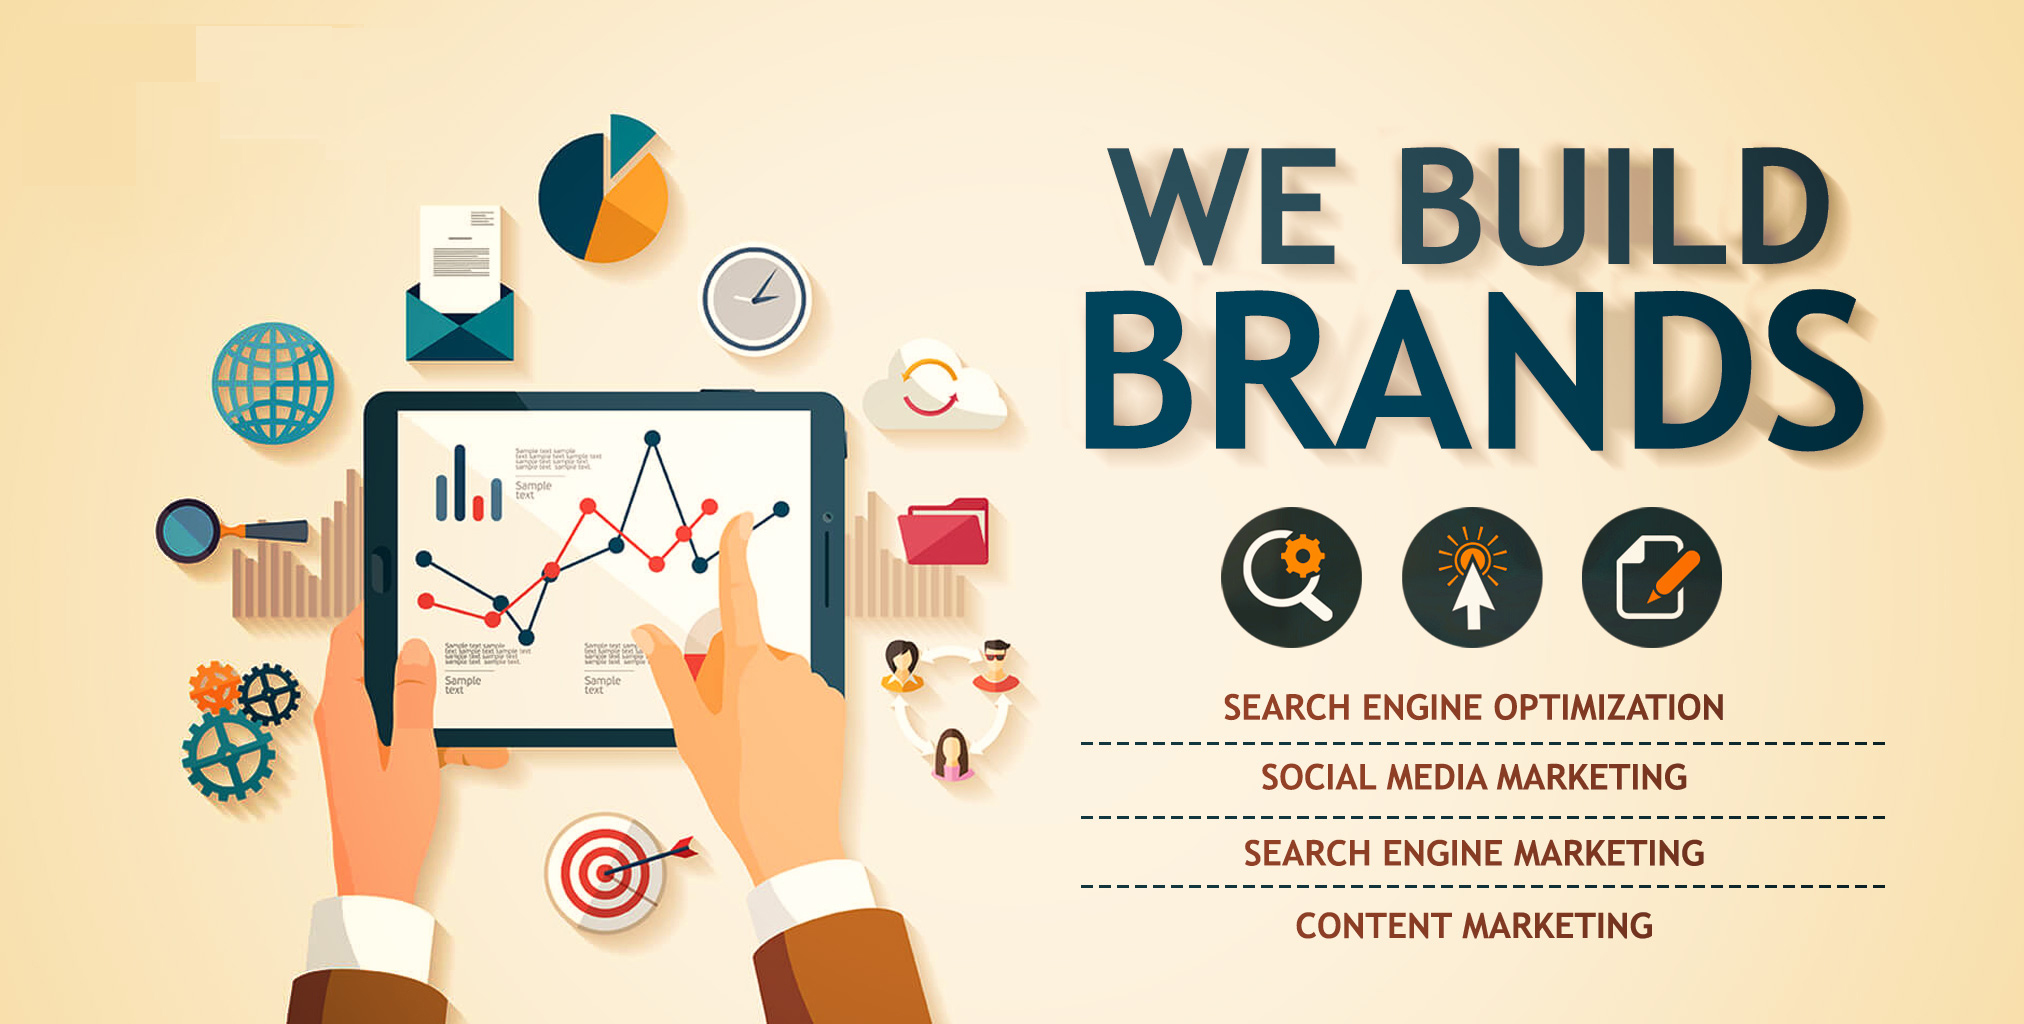 Build Brand Business Solutions, Digital Marketing Company In Bangalore, Digital Marketing Company In Jayanagar, Digital Marketing Company In Kormangala, Digital Marketing Company In BTM Layout, Digital Marketing Company In South Ban